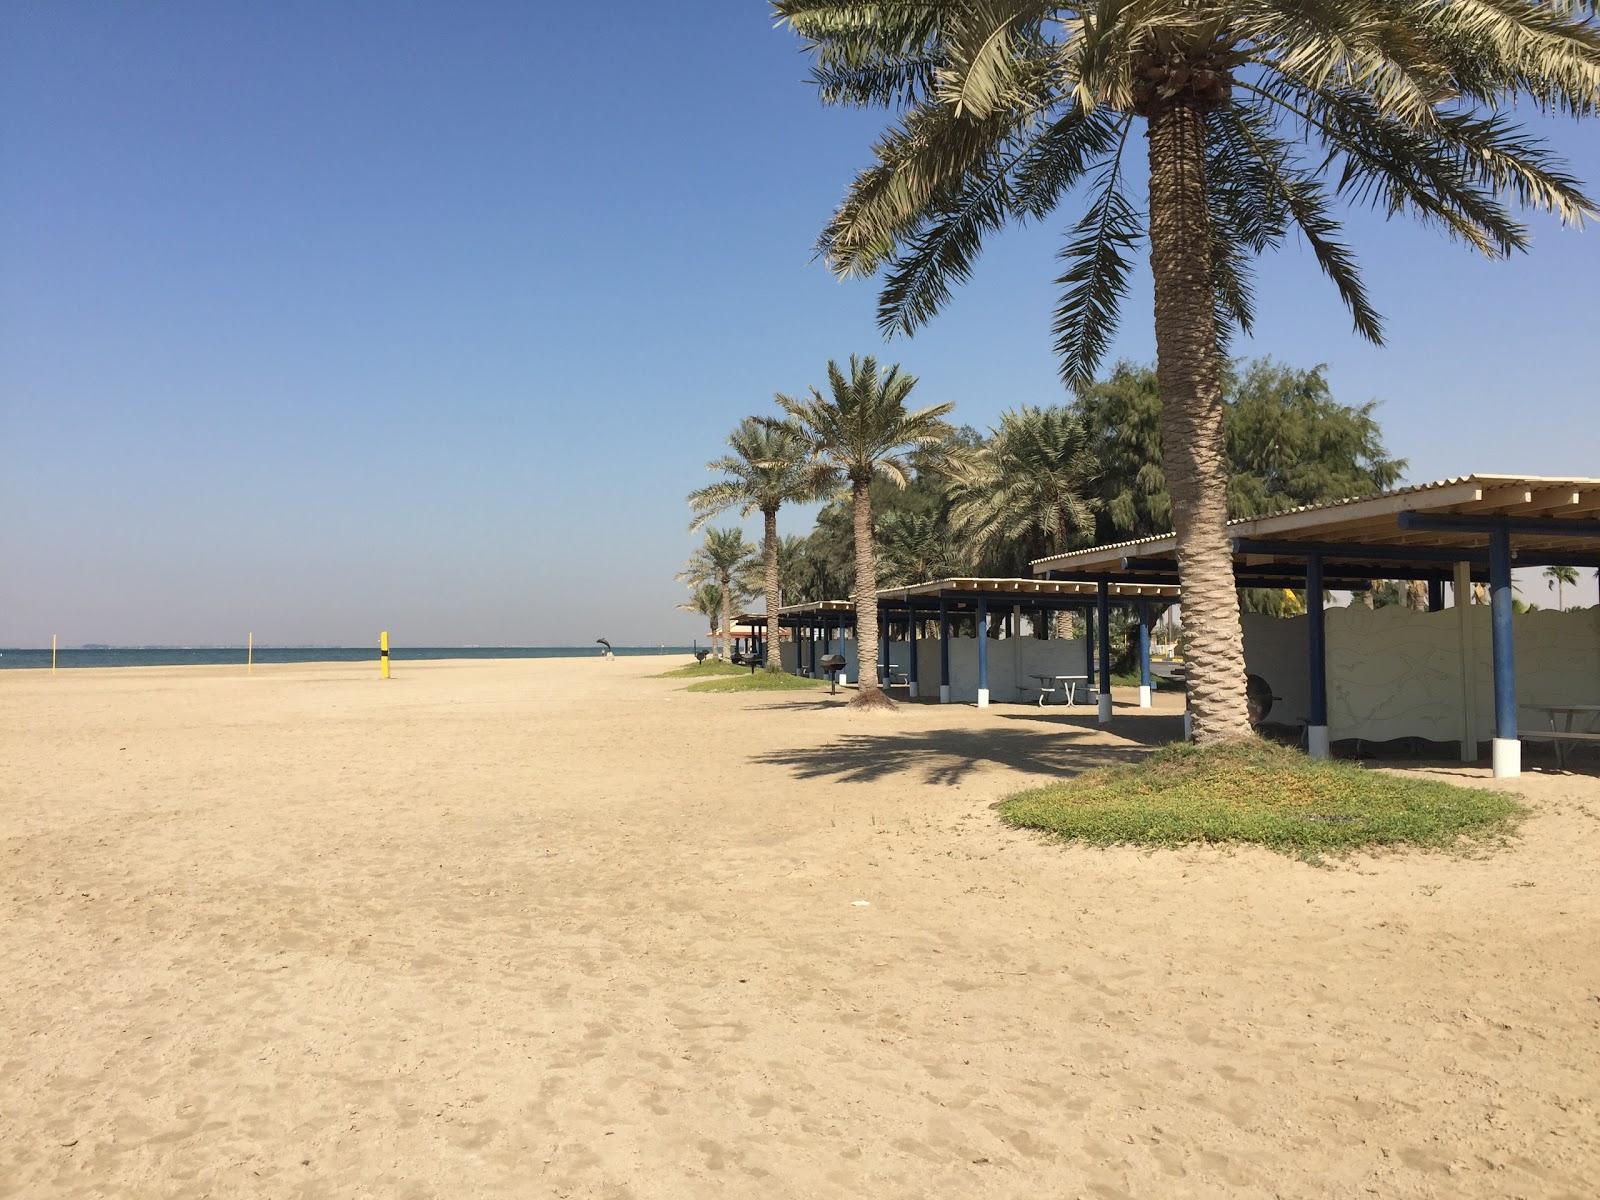 Visit Half Moon Beach On Your Trip To Al Khobar Or Saudi Arabia